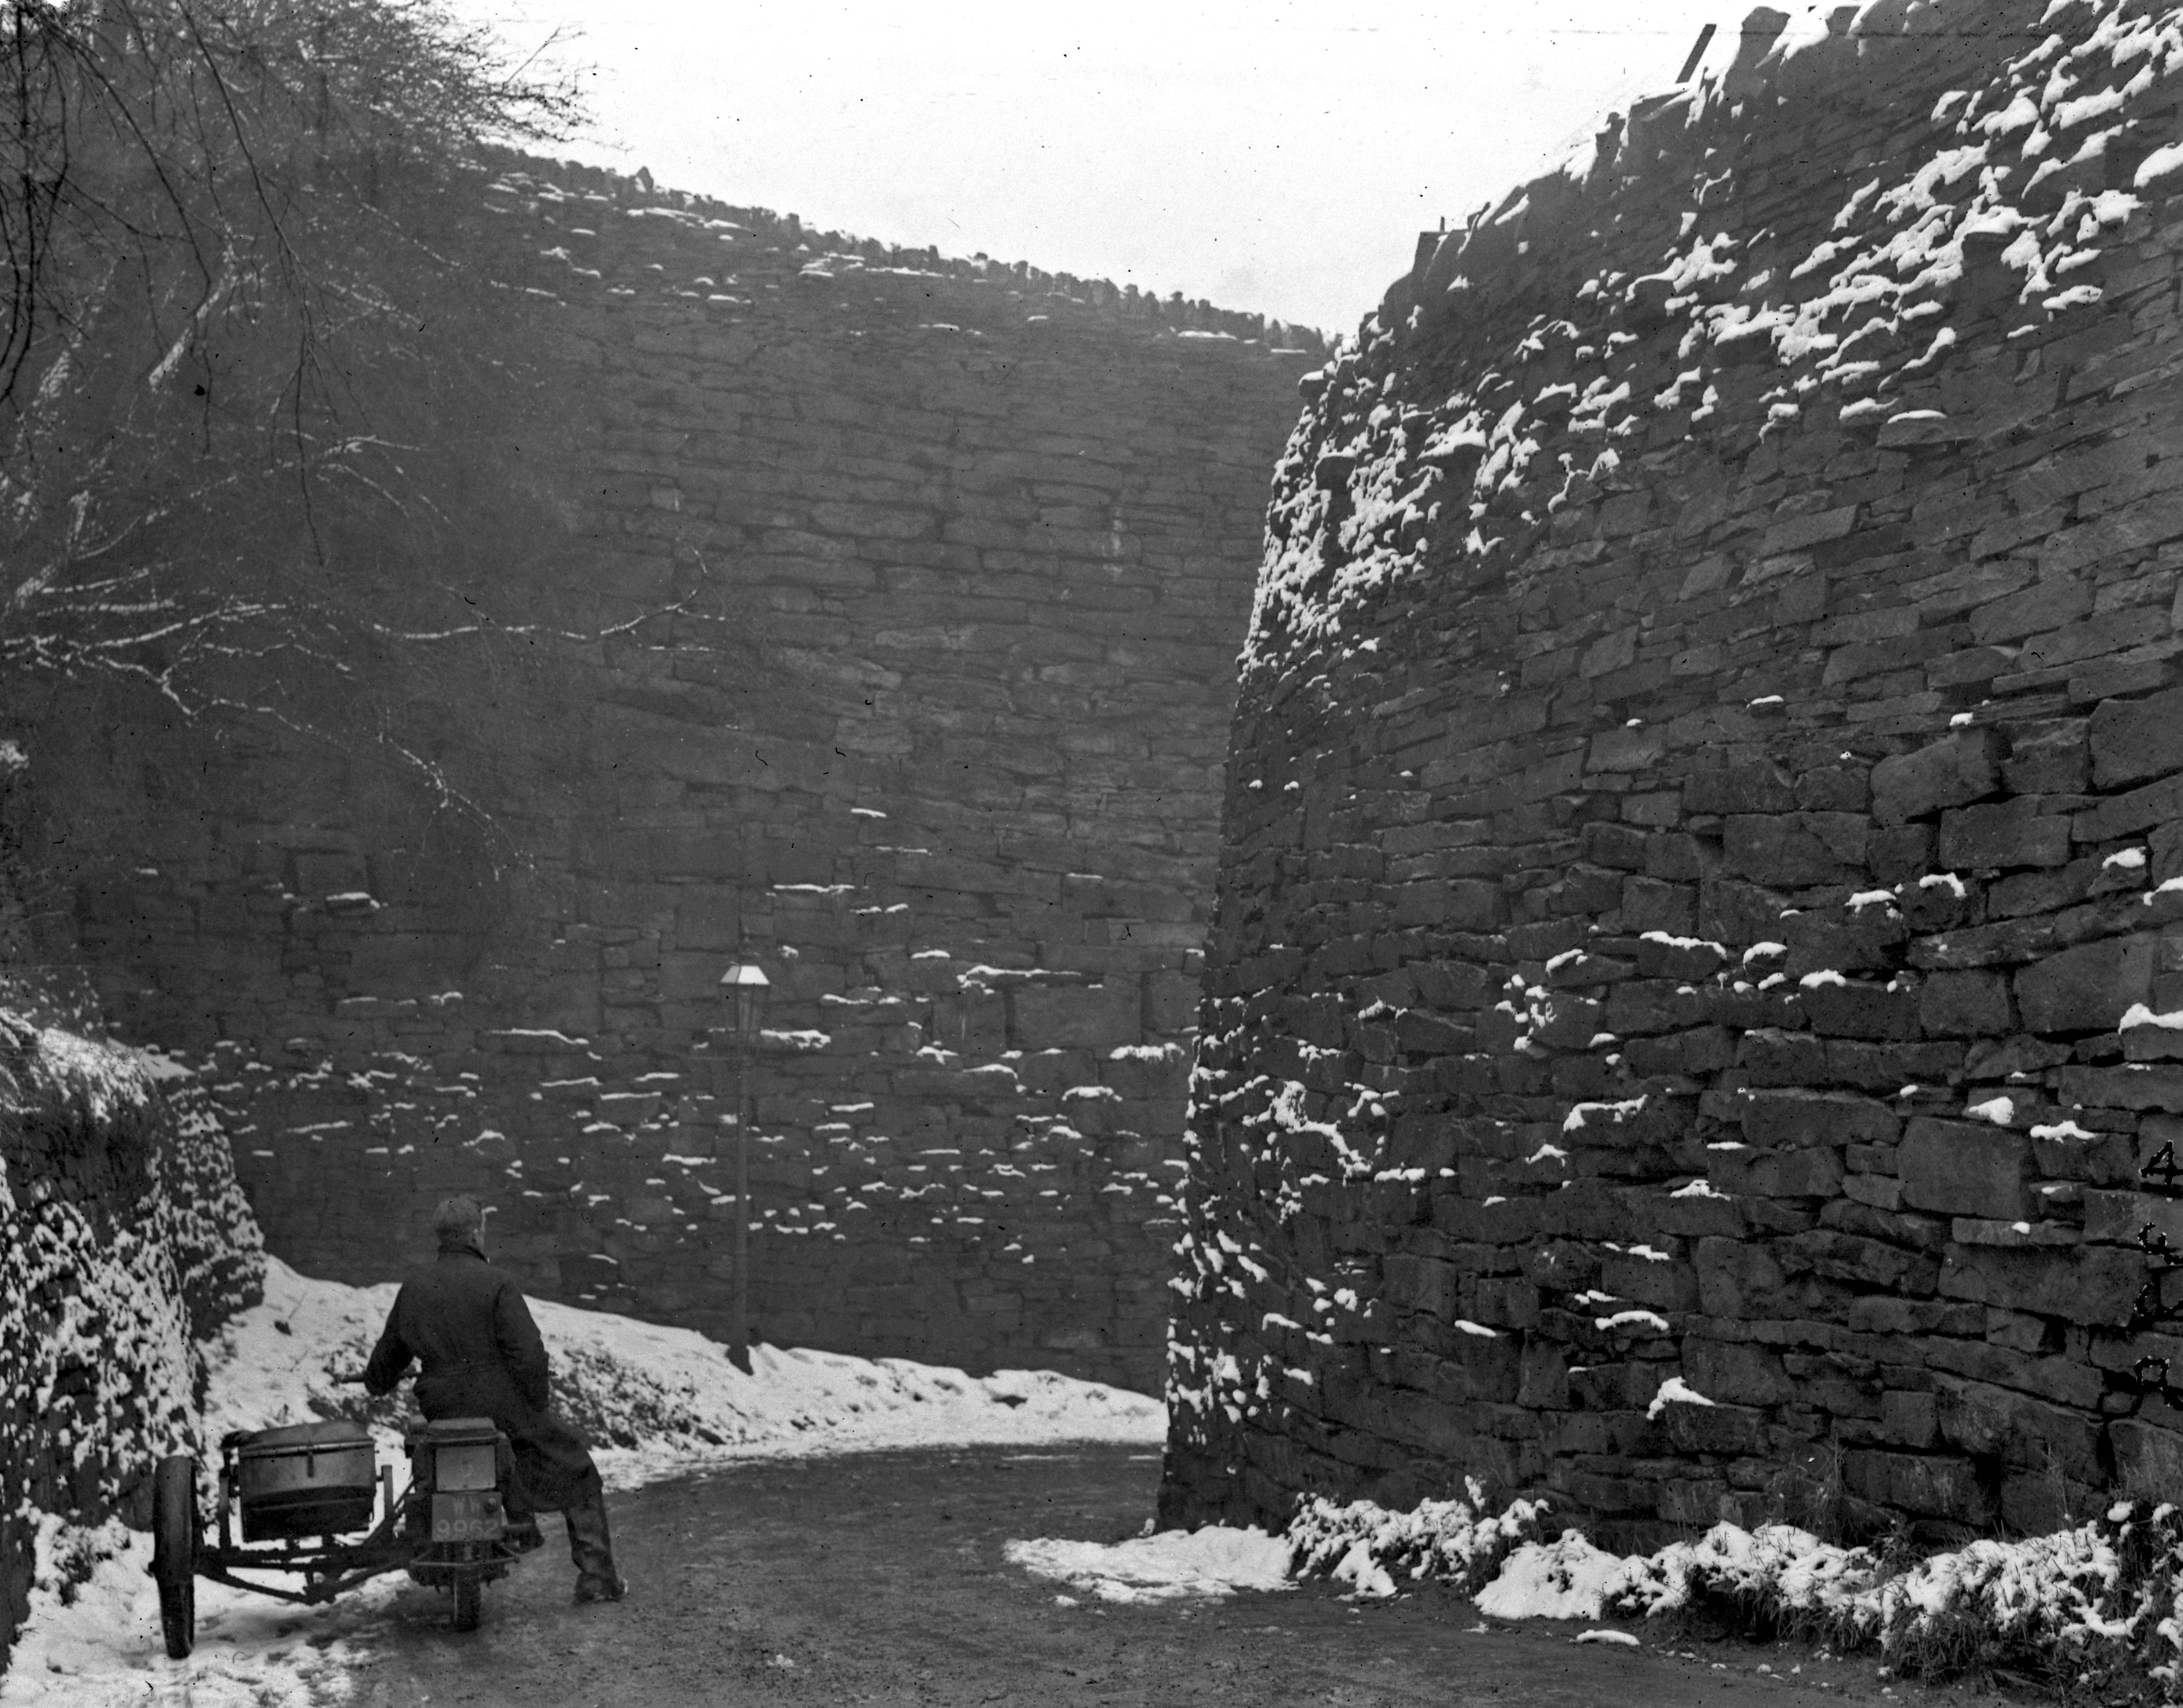 Walls of Jericho, Thornton